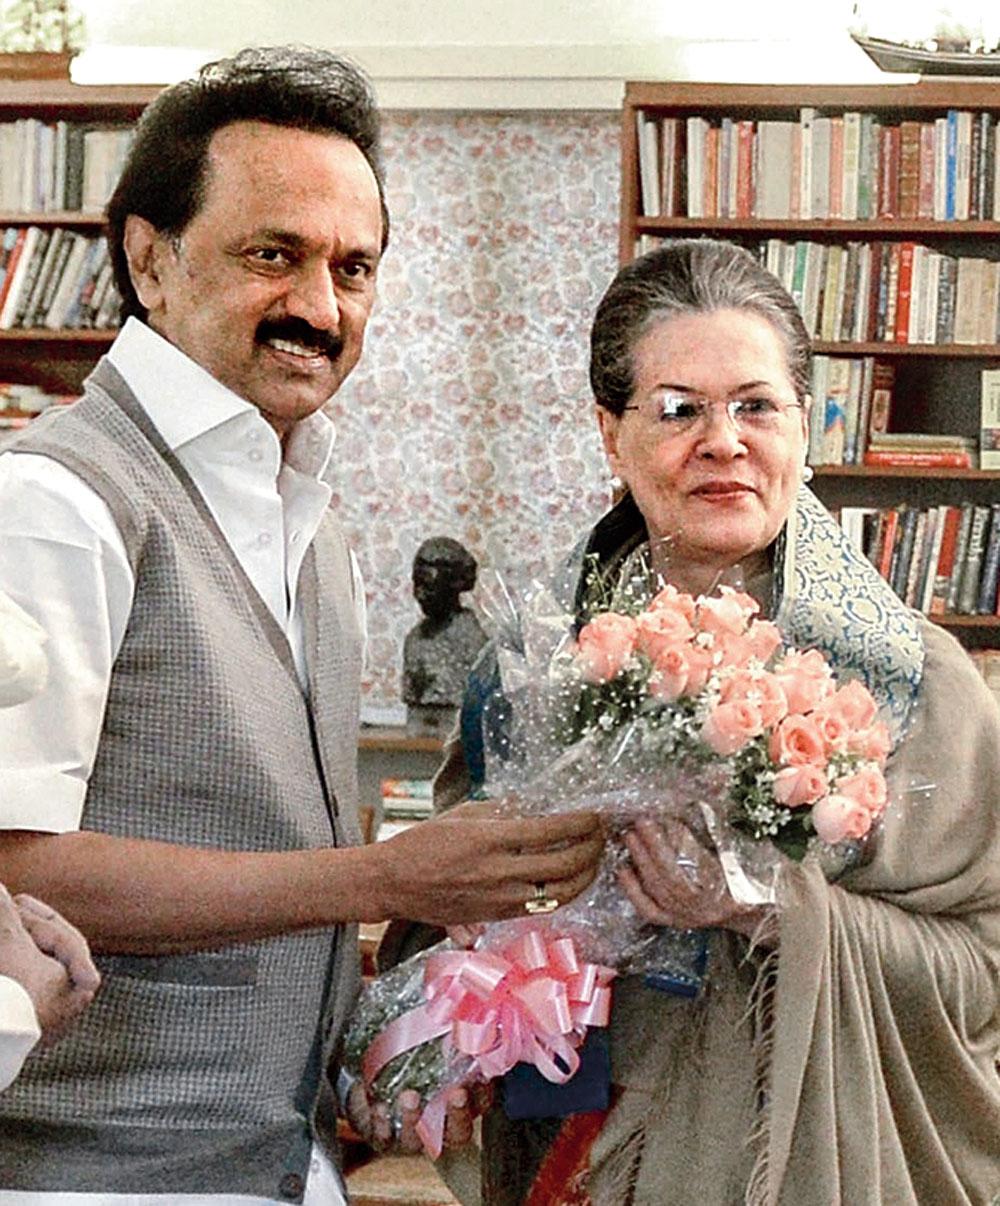 DMK president MK Stalin offers a bouquet to Sonia Gandhi on her birthday in New Delhi on Sunday.